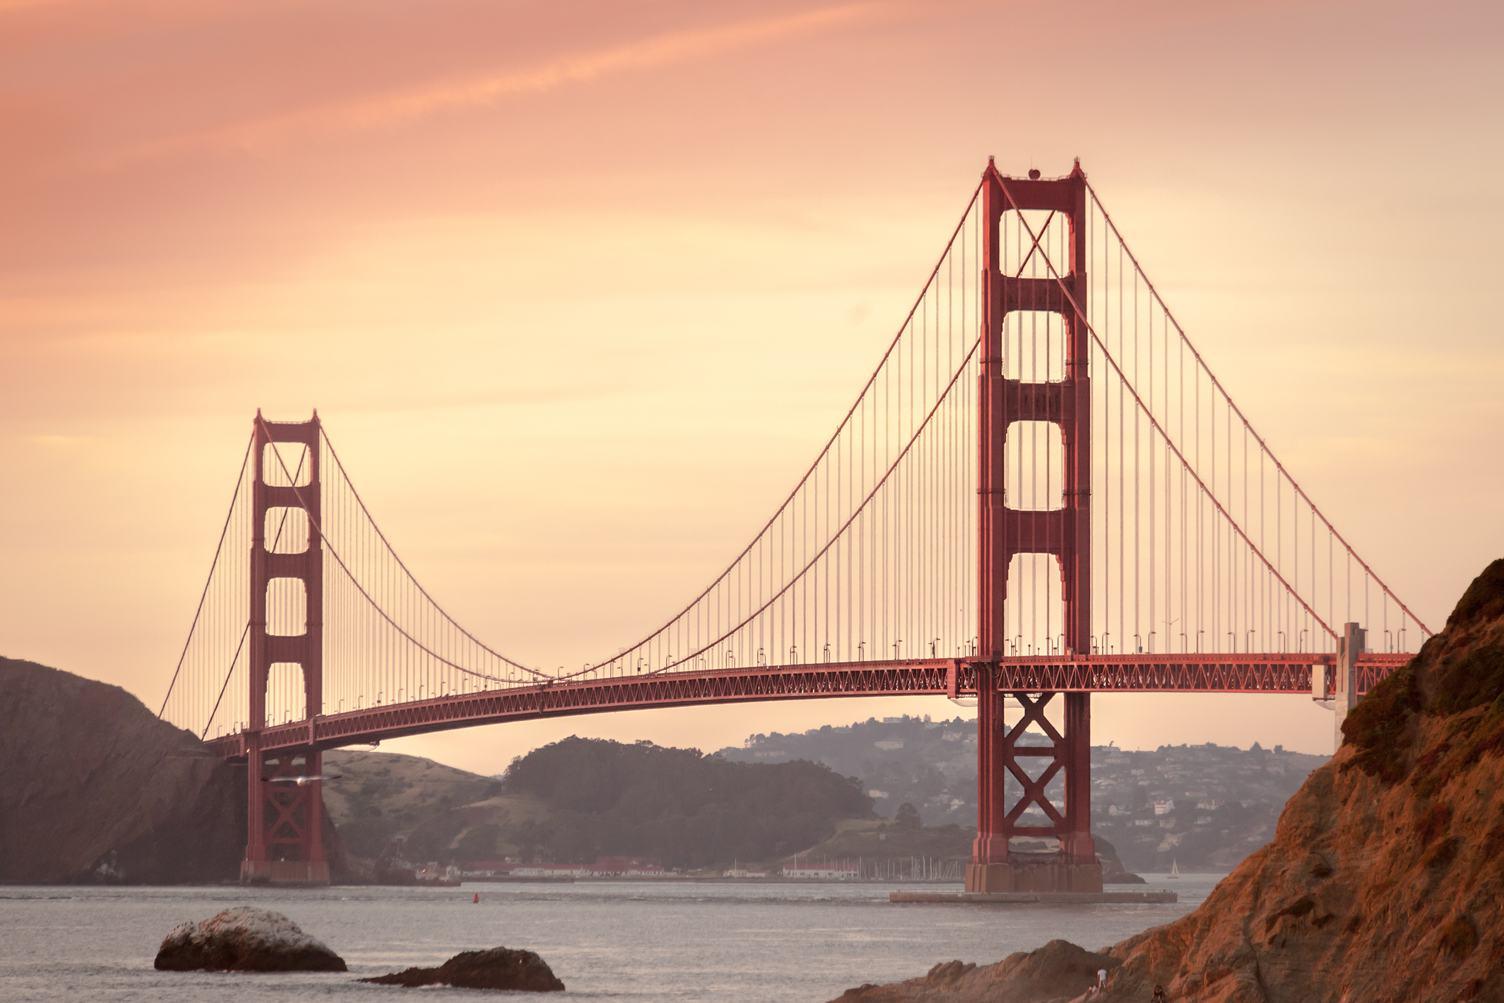 Famous Golden Gate Bridge at Sunset